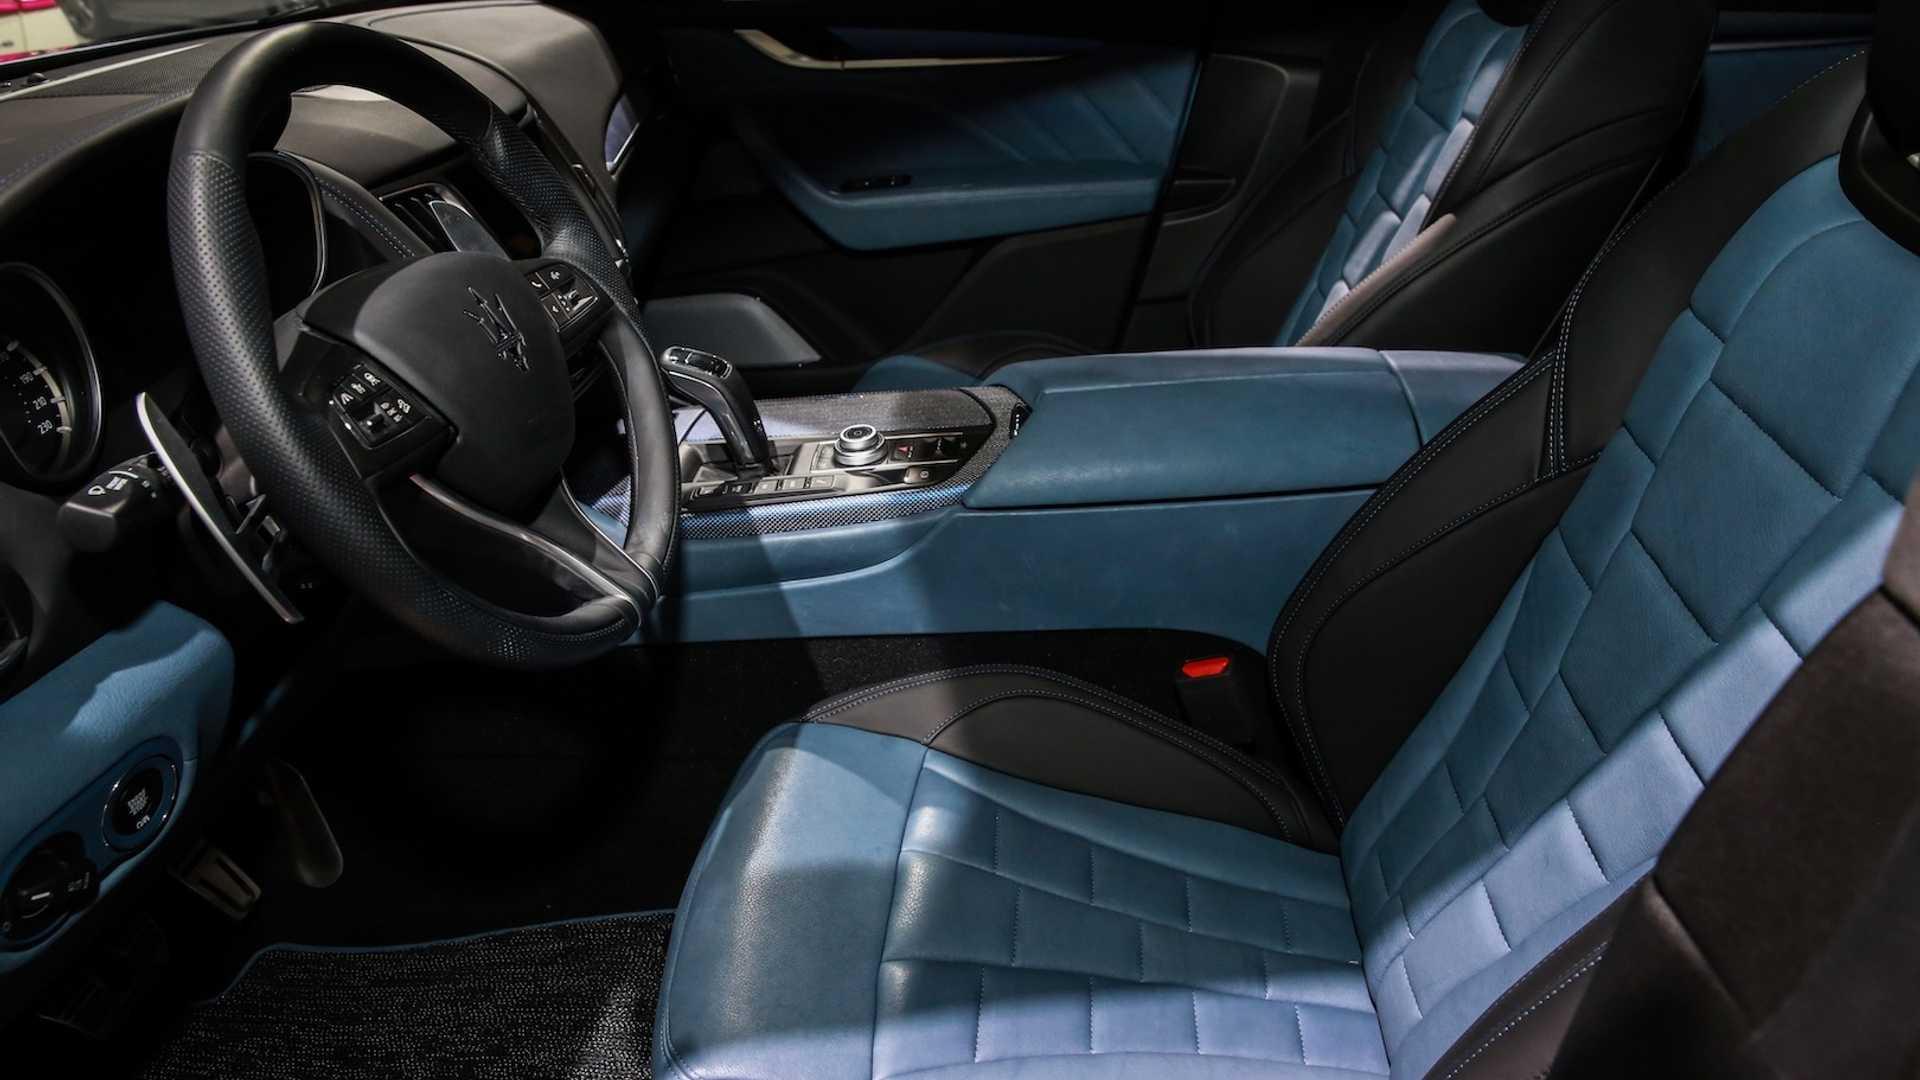 Звезда NBA Рэй Аллен купил эксклюзивный Maserati Levante 2